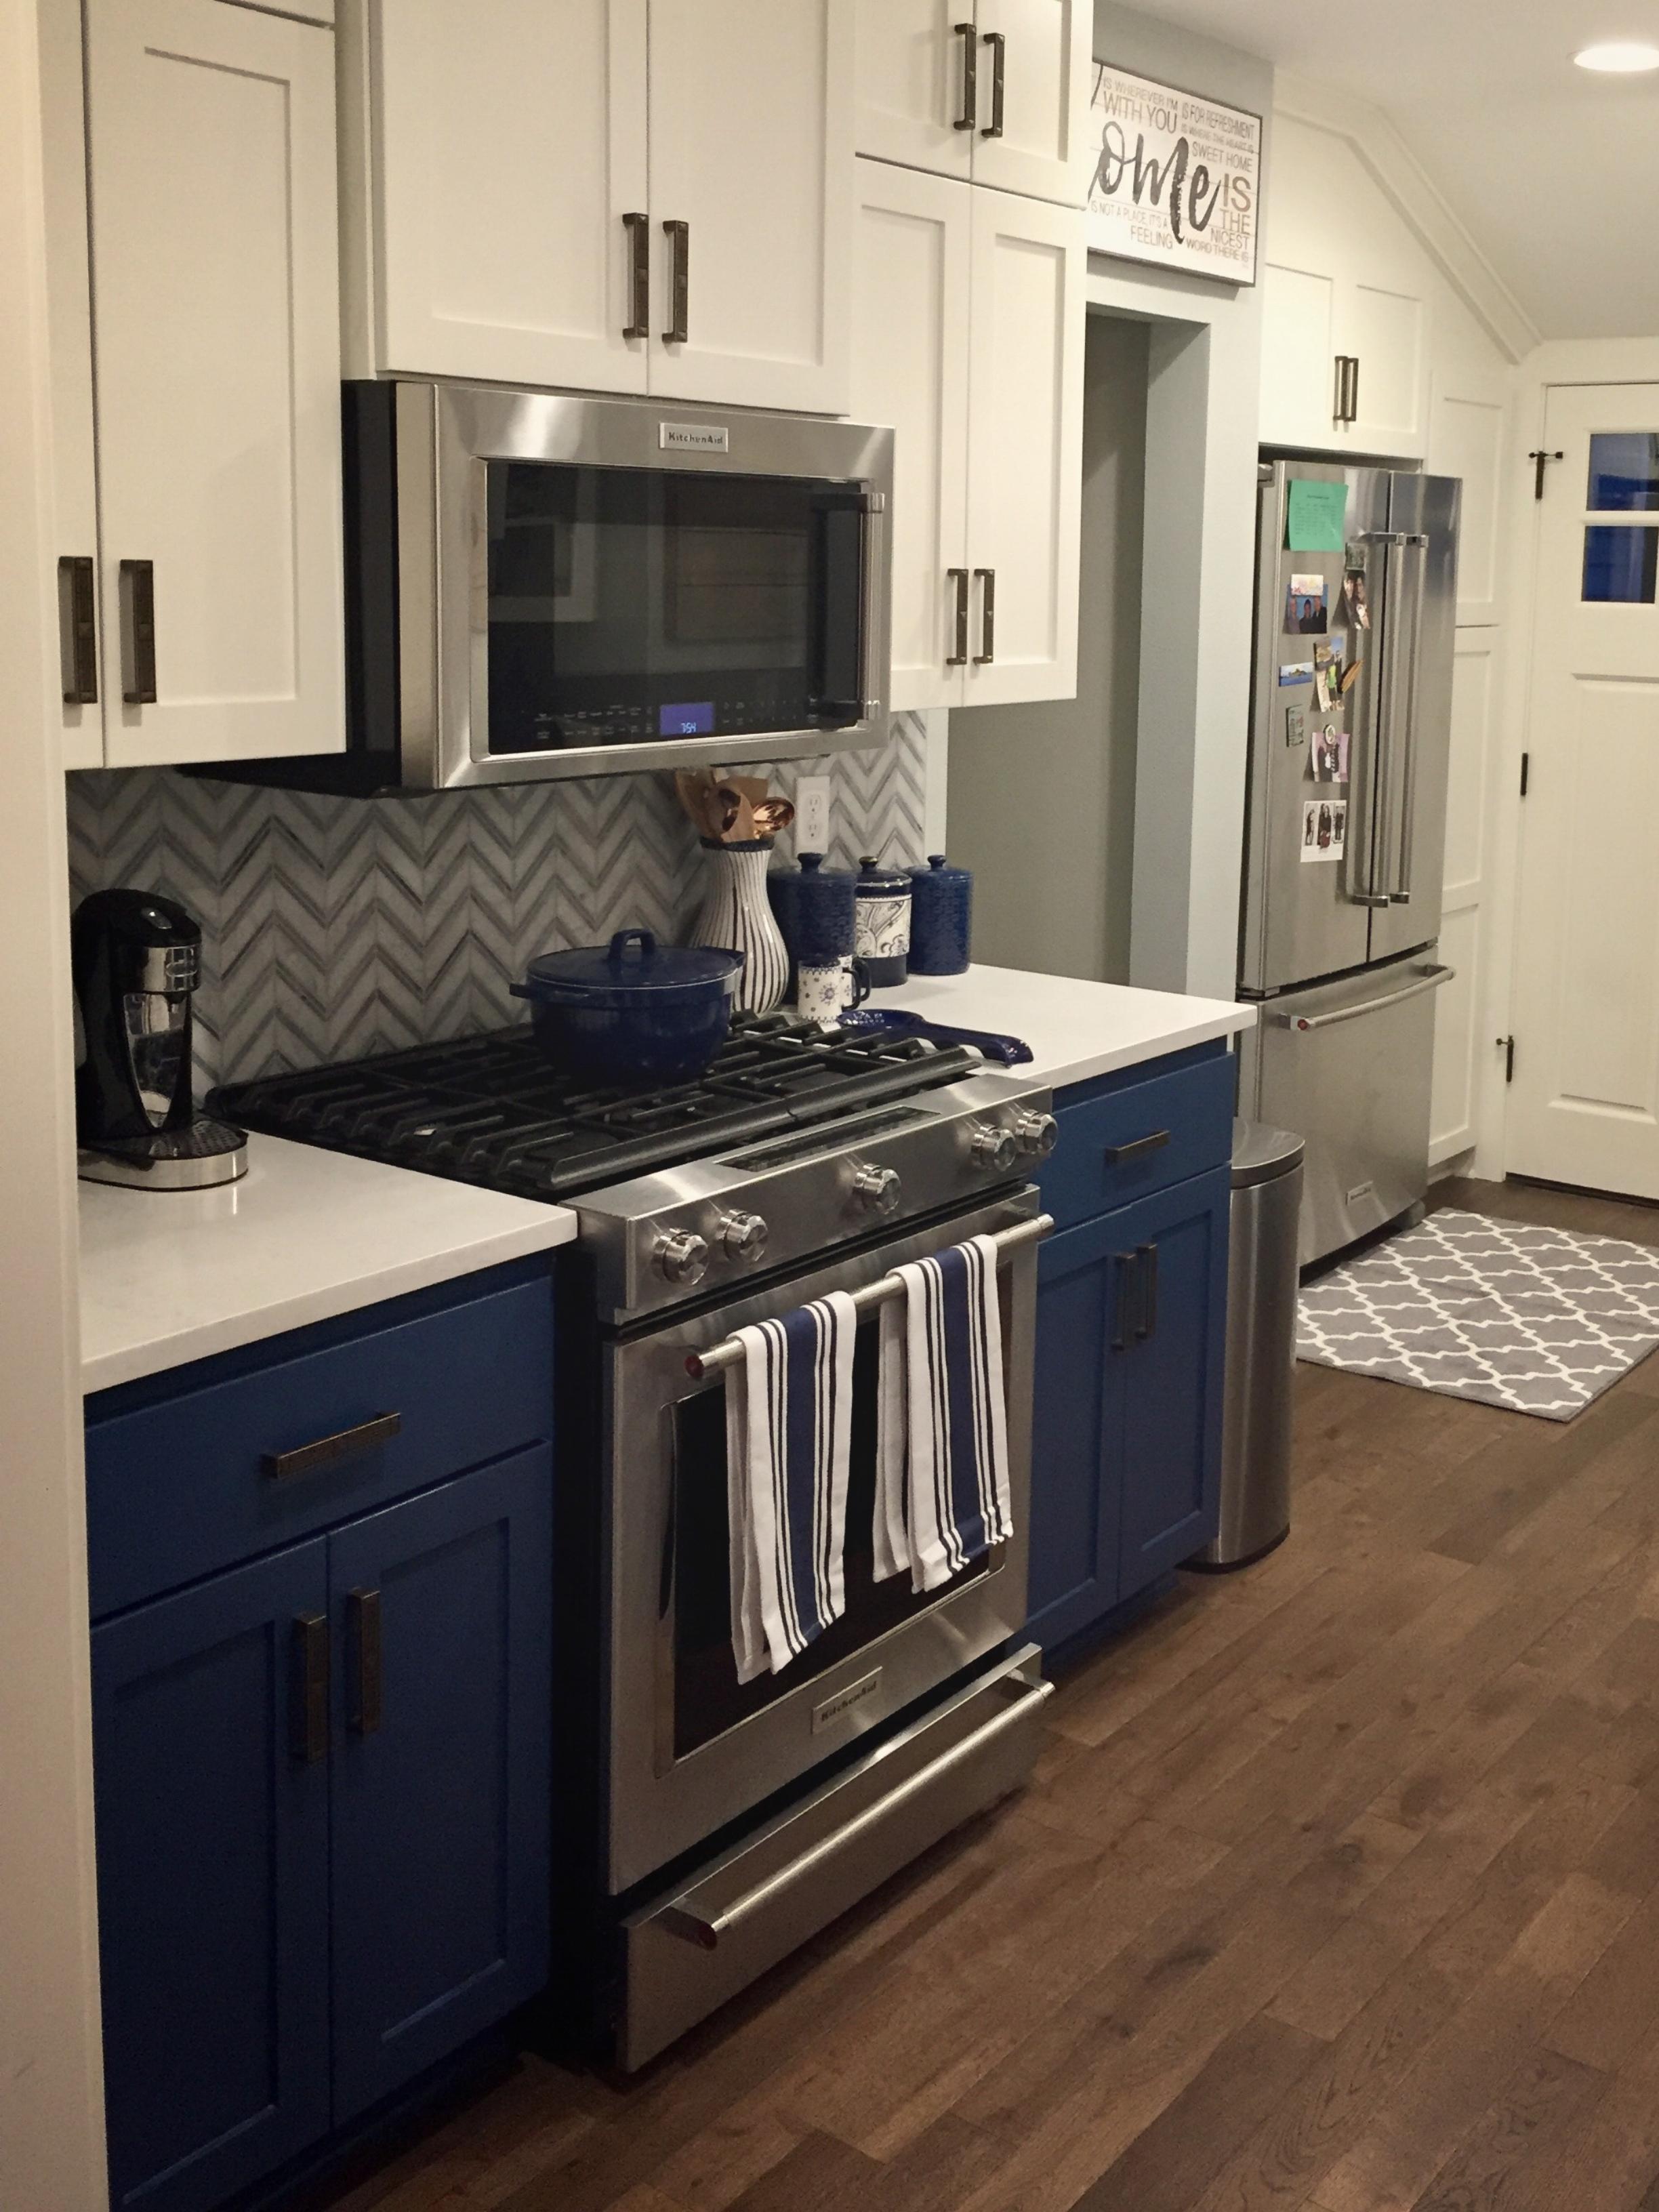 Batista Residence Kitchen 4.jpeg